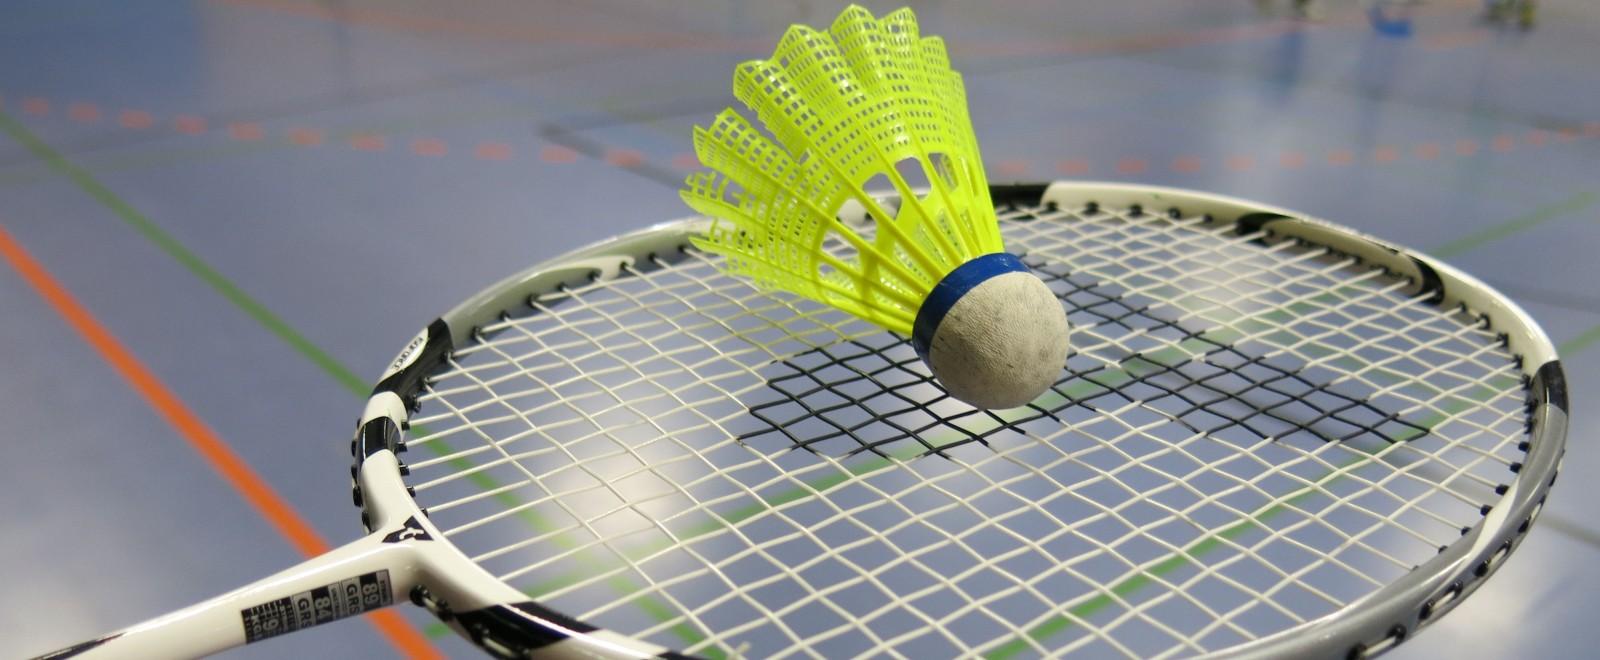 badminton_00